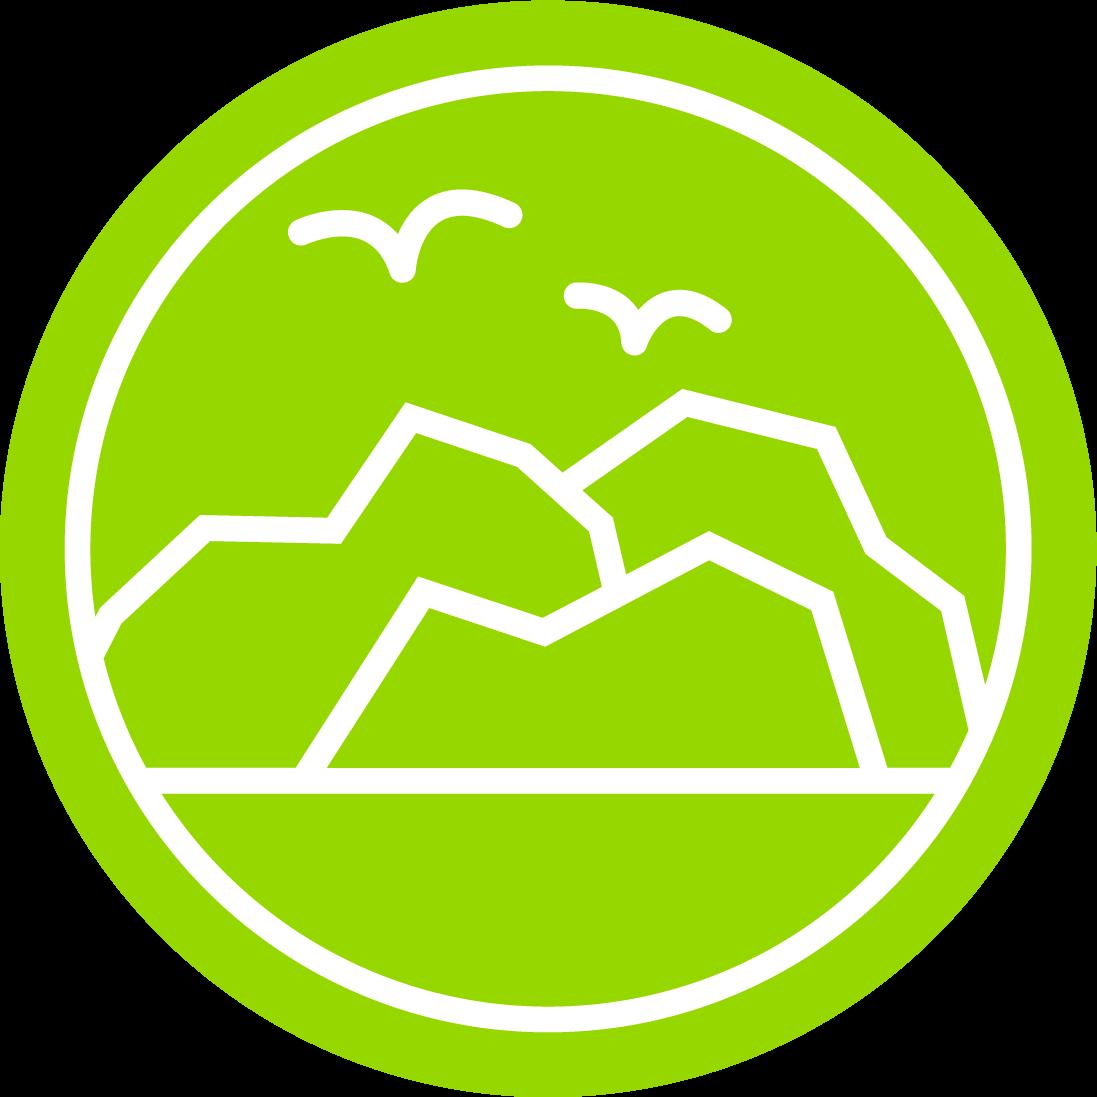 Landfills icon